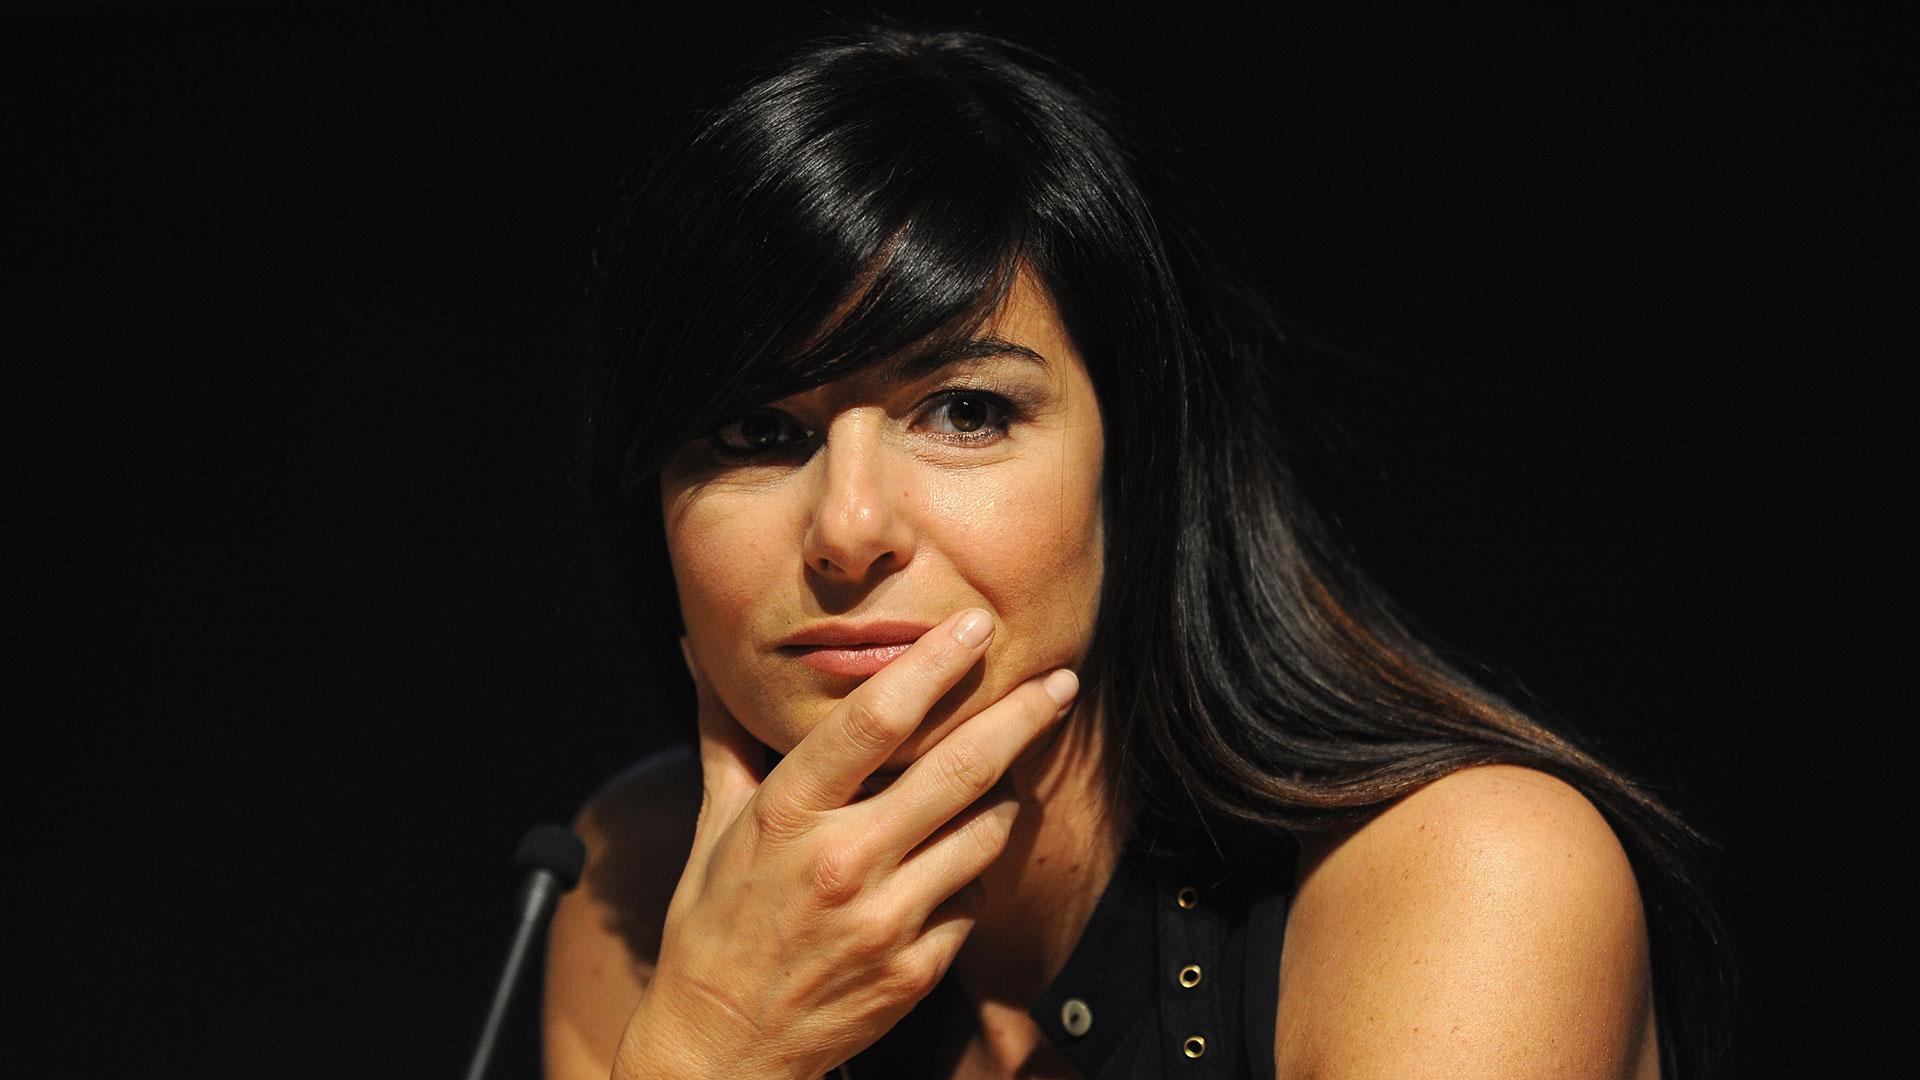 Ilaria D'Amico: